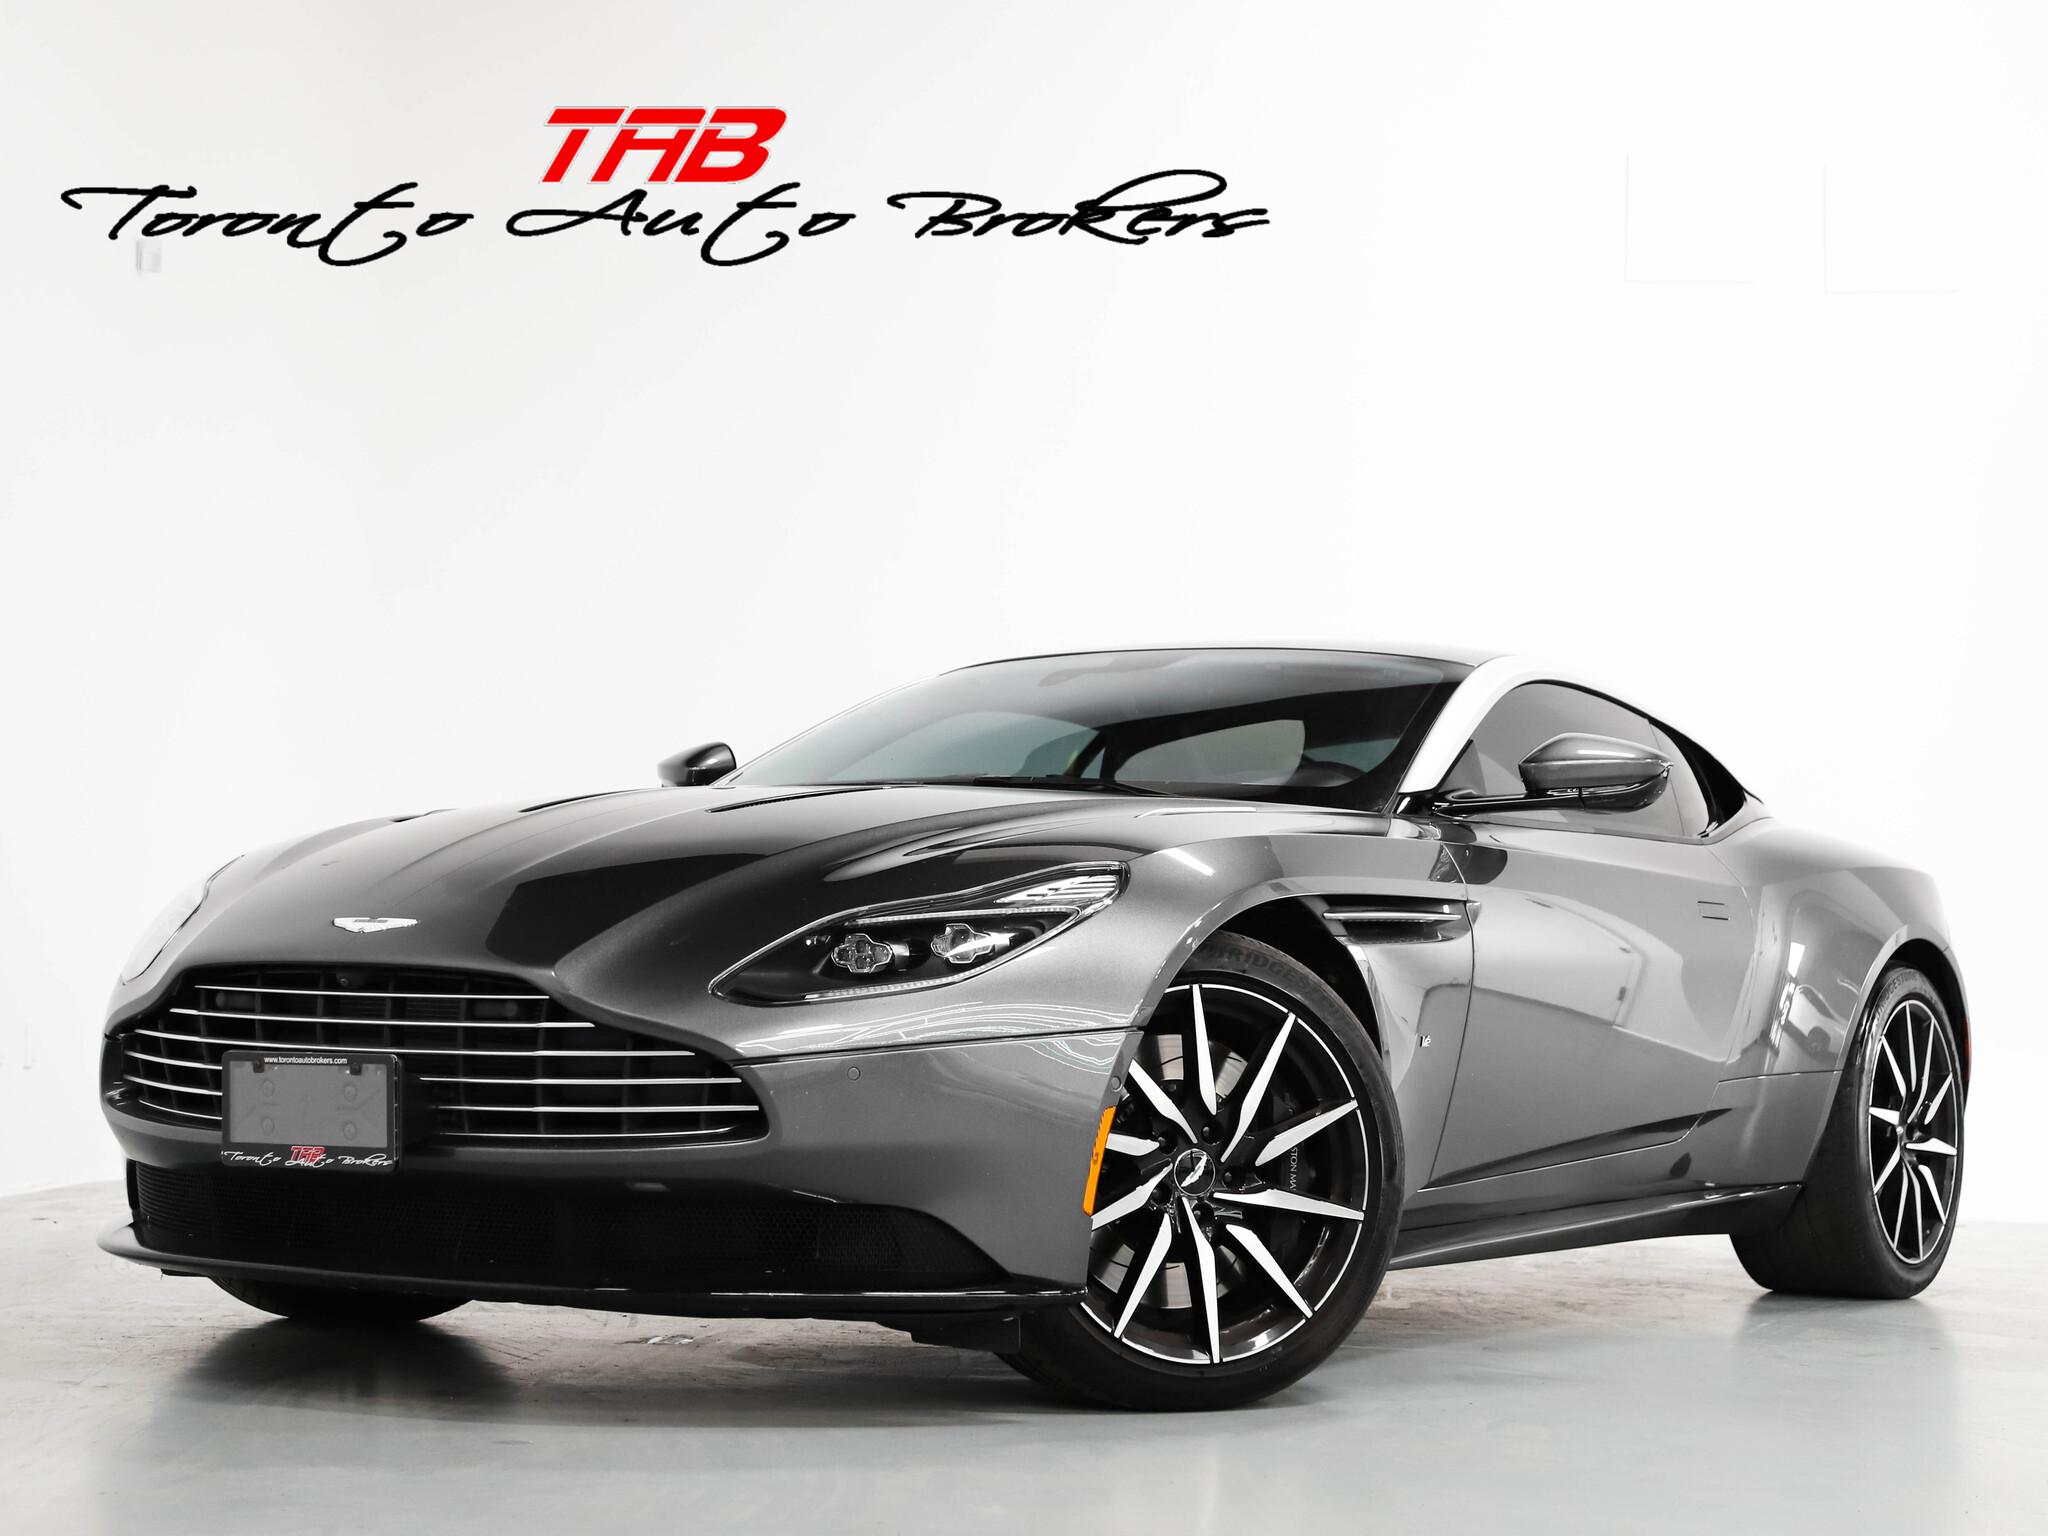 2017 Aston Martin Db11 In Vaughan On Toronto Auto Brokers Scfrmfavxhgl02036